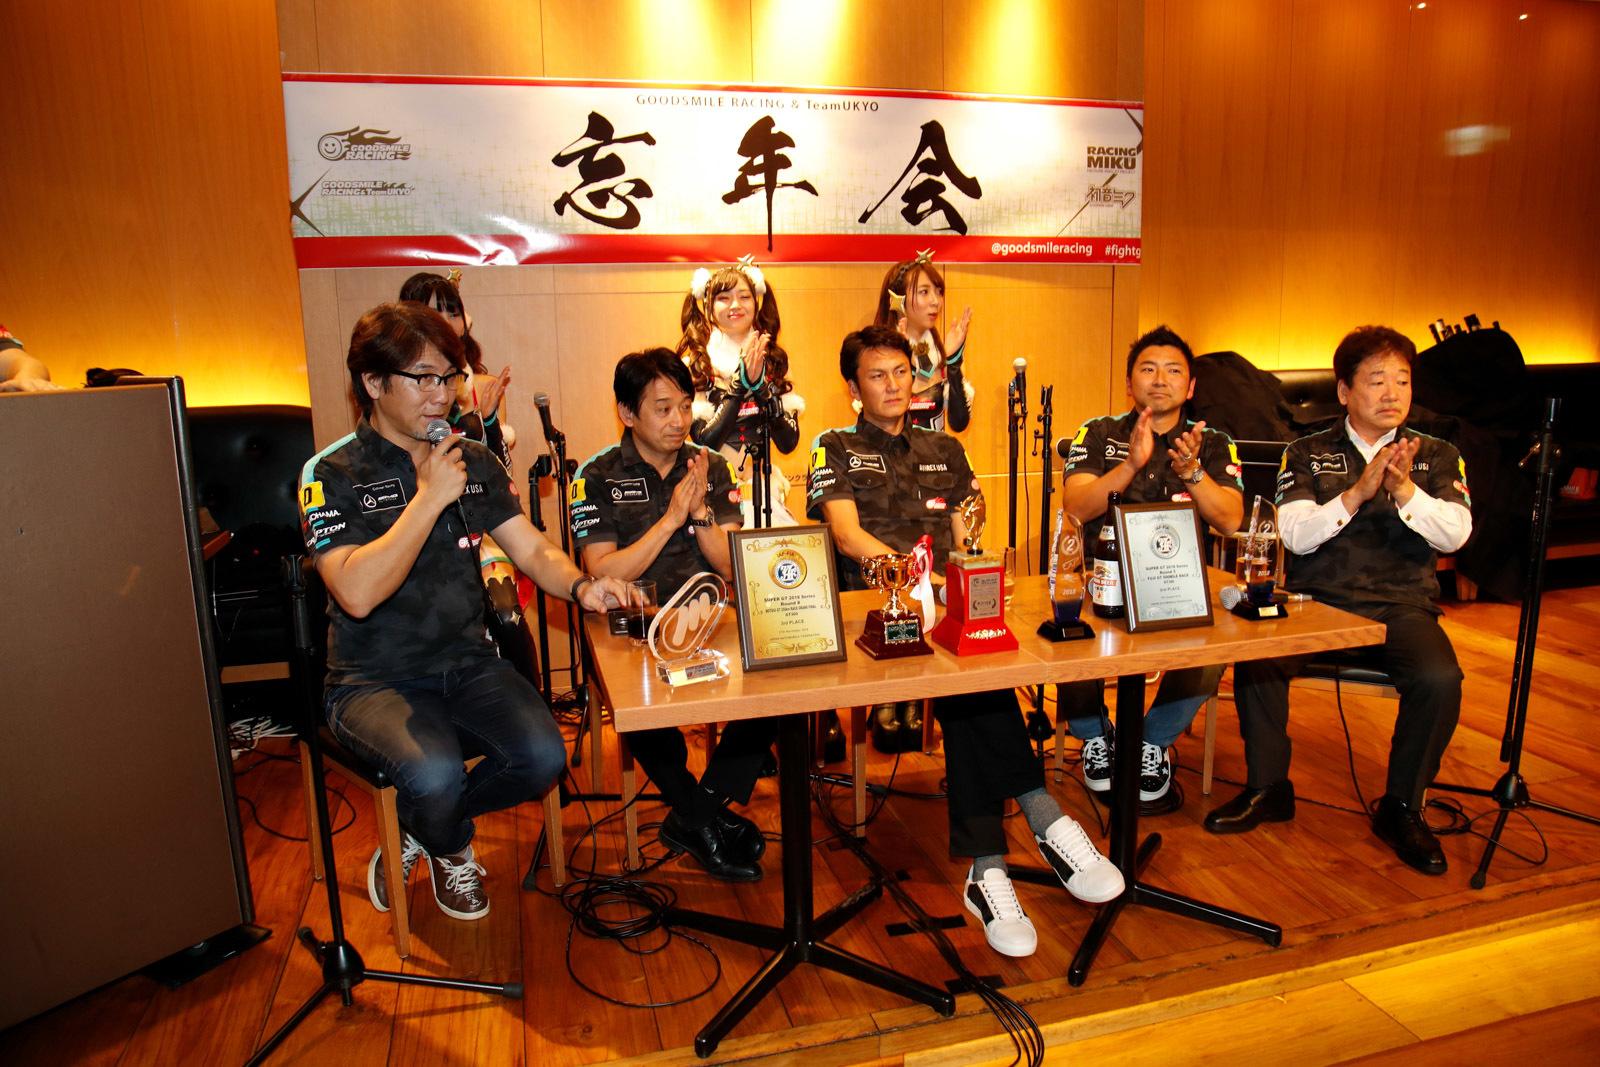 GOODSMILE RACING & TeamUKYOは2019年も走ります!_e0379343_16361823.jpg